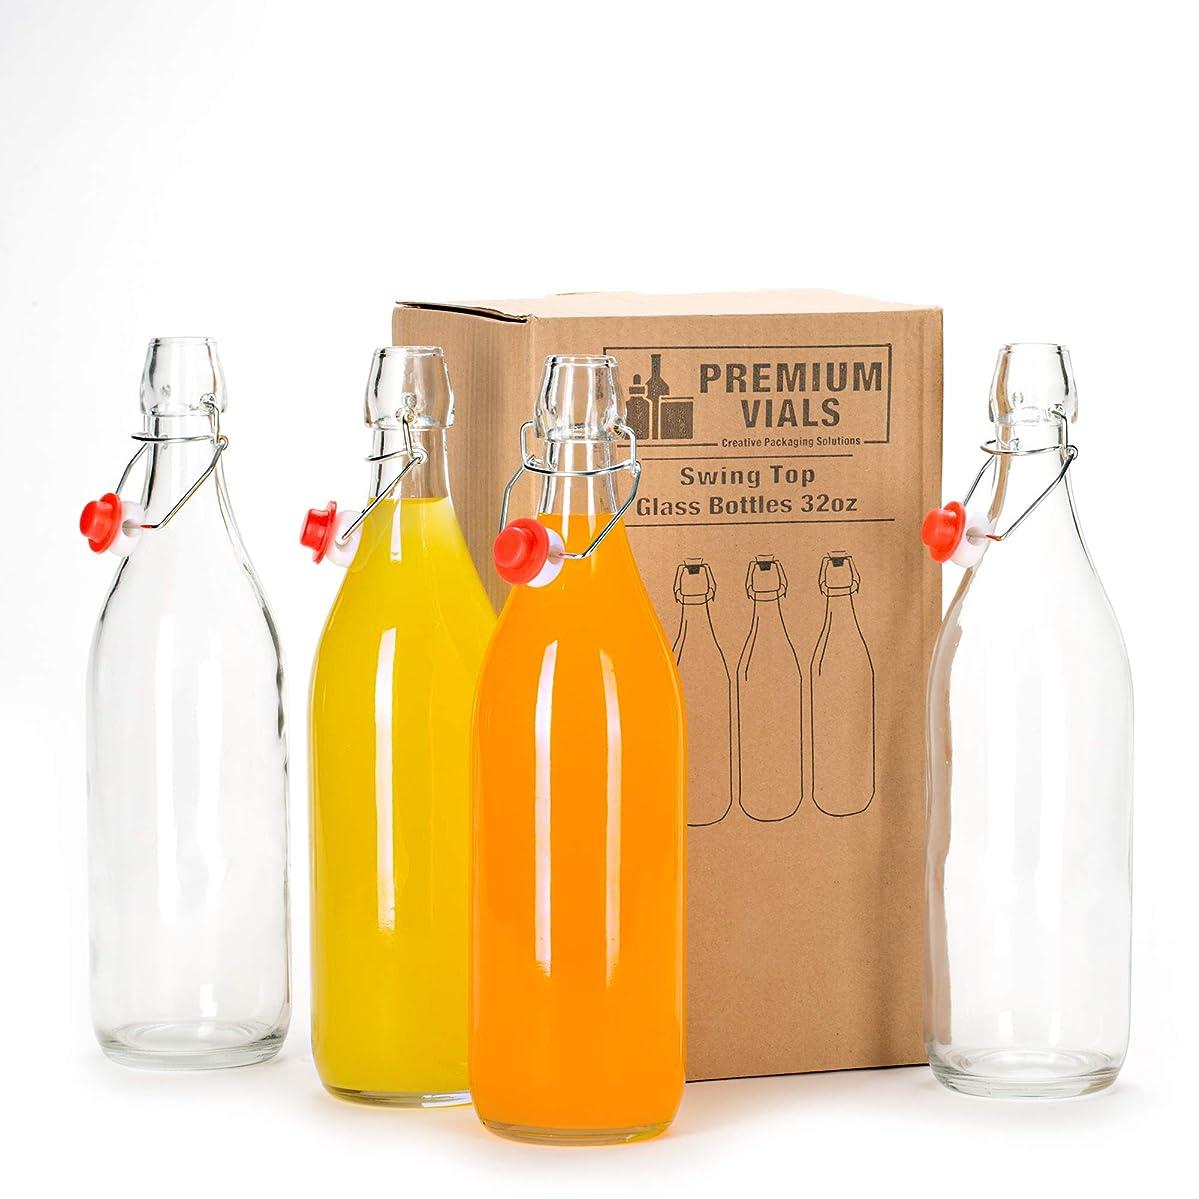 Set of 4-33.75 Oz Giara Glass Bottle with Stopper Caps, Carafe Swing Top Bottles with Airtight Lids for Oil, Vinegar,Beer, Water, Kombucha, Kefir, Soda